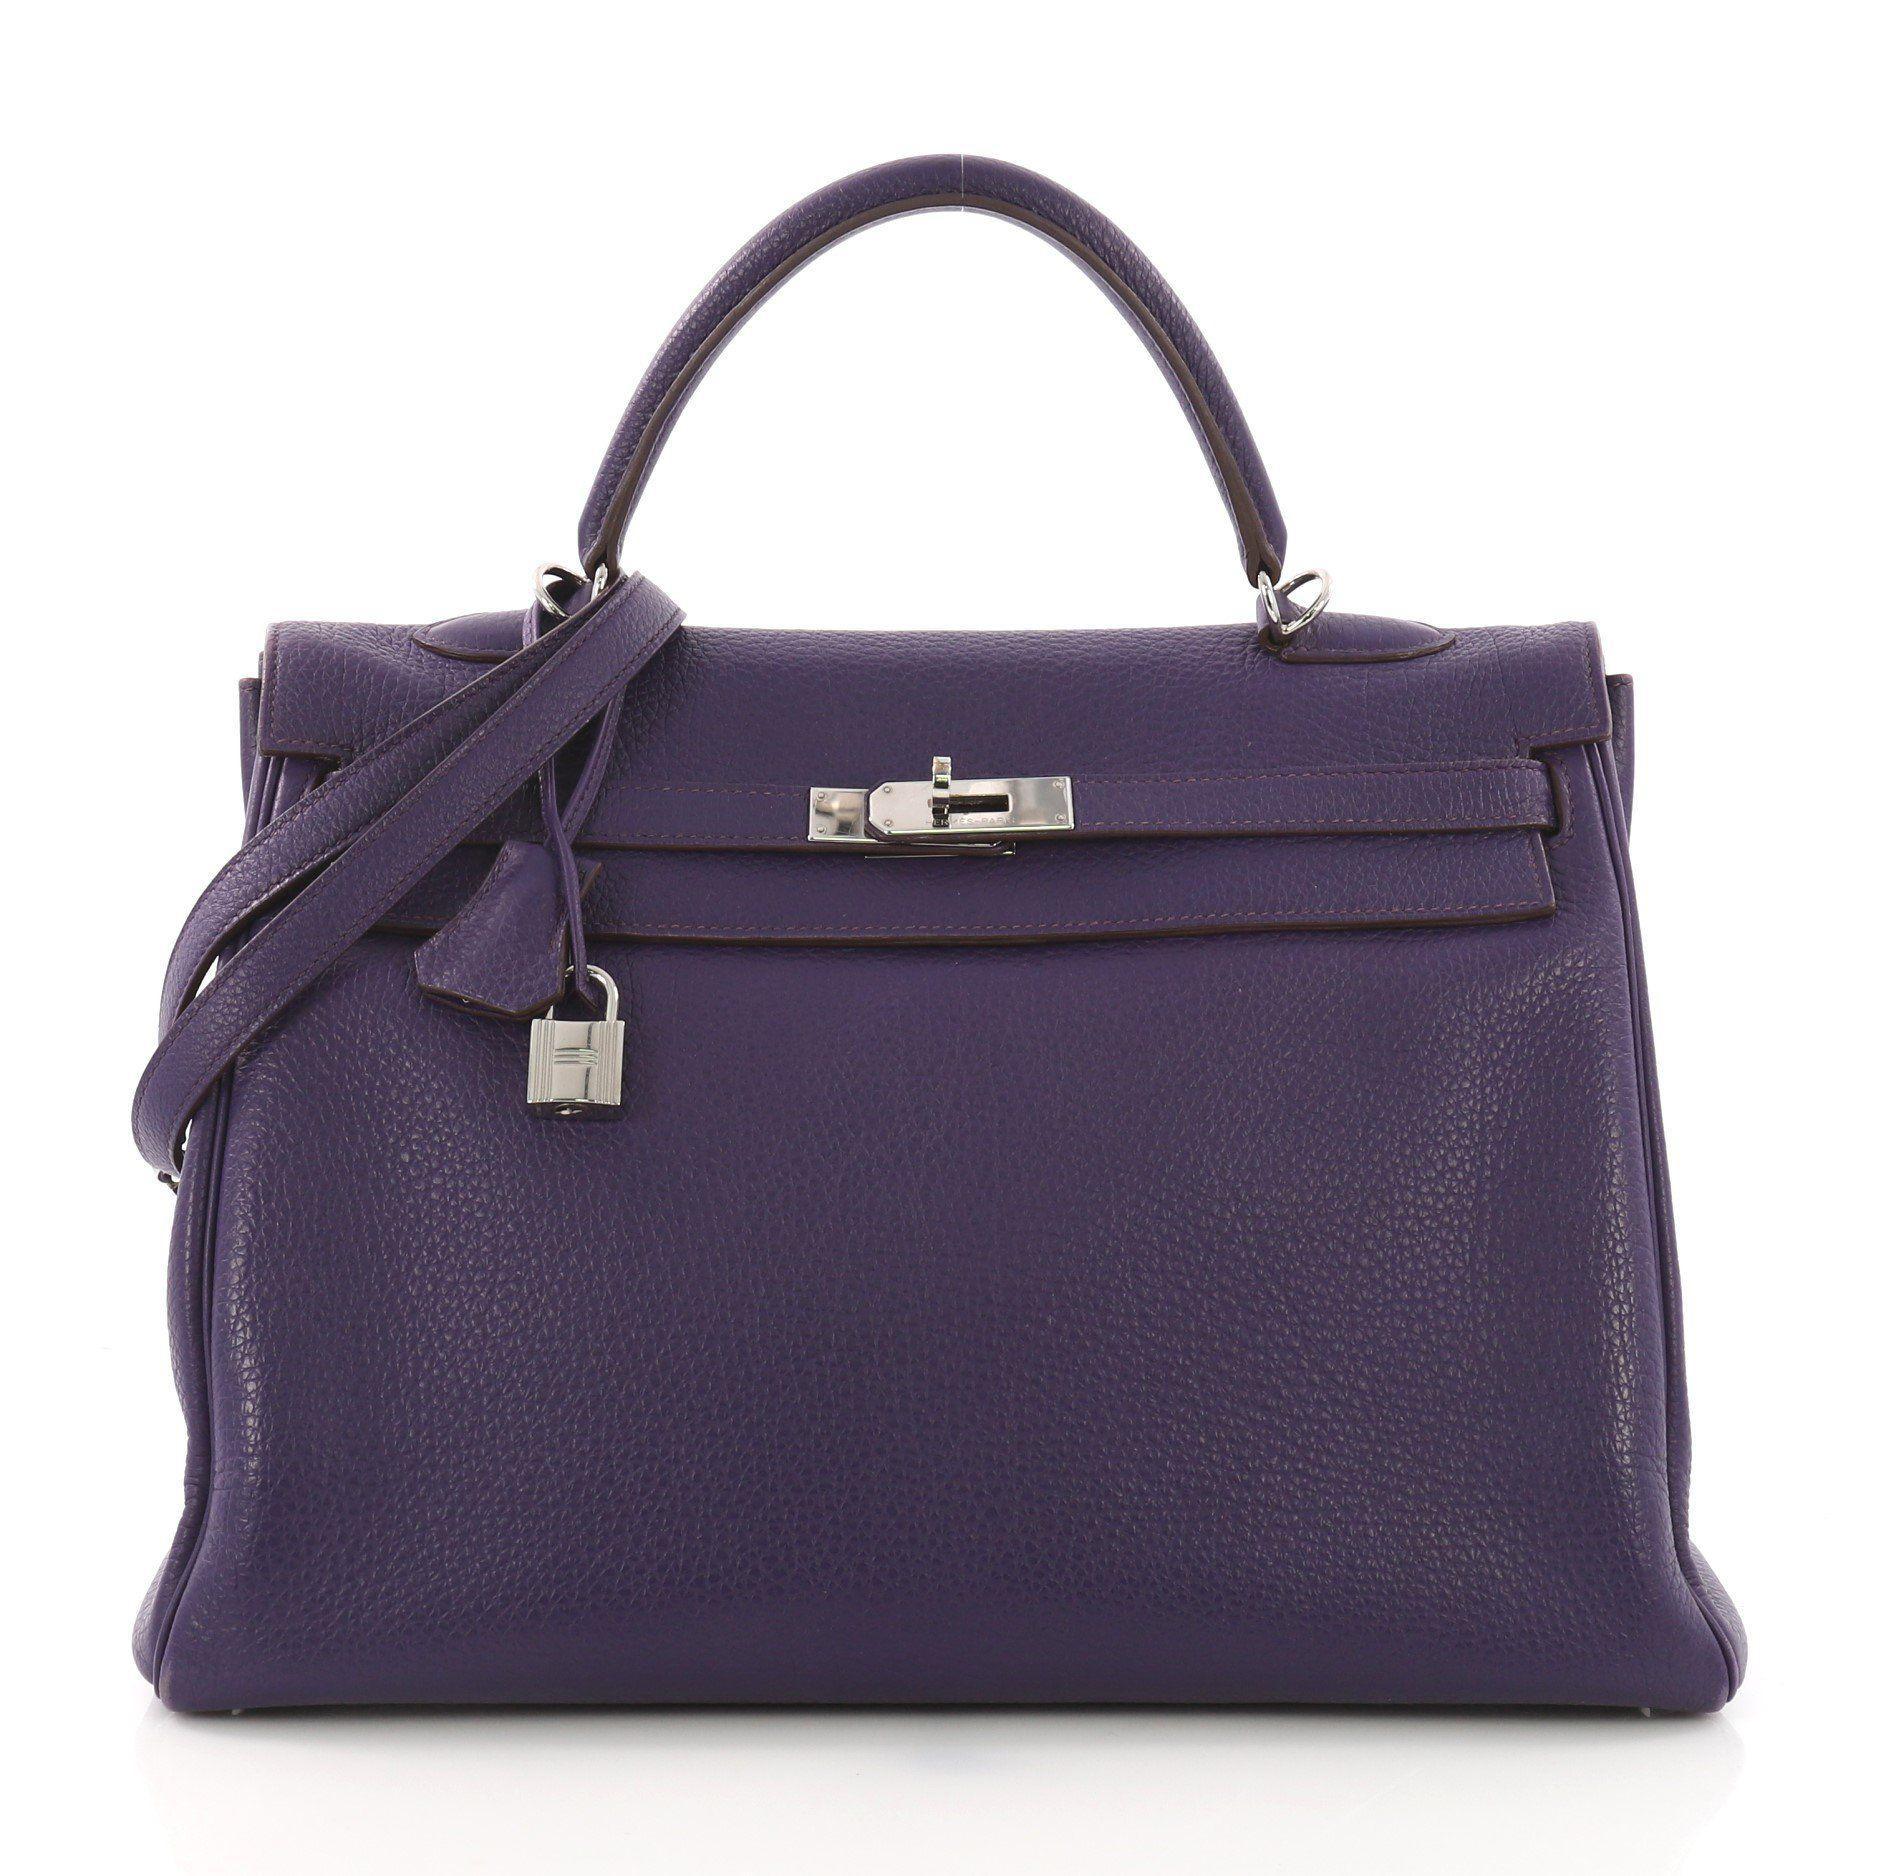 542540f2c8a4 Hermès. Women s Purple Pre Owned Kelly Handbag Iris Togo With Palladium  Hardware 35